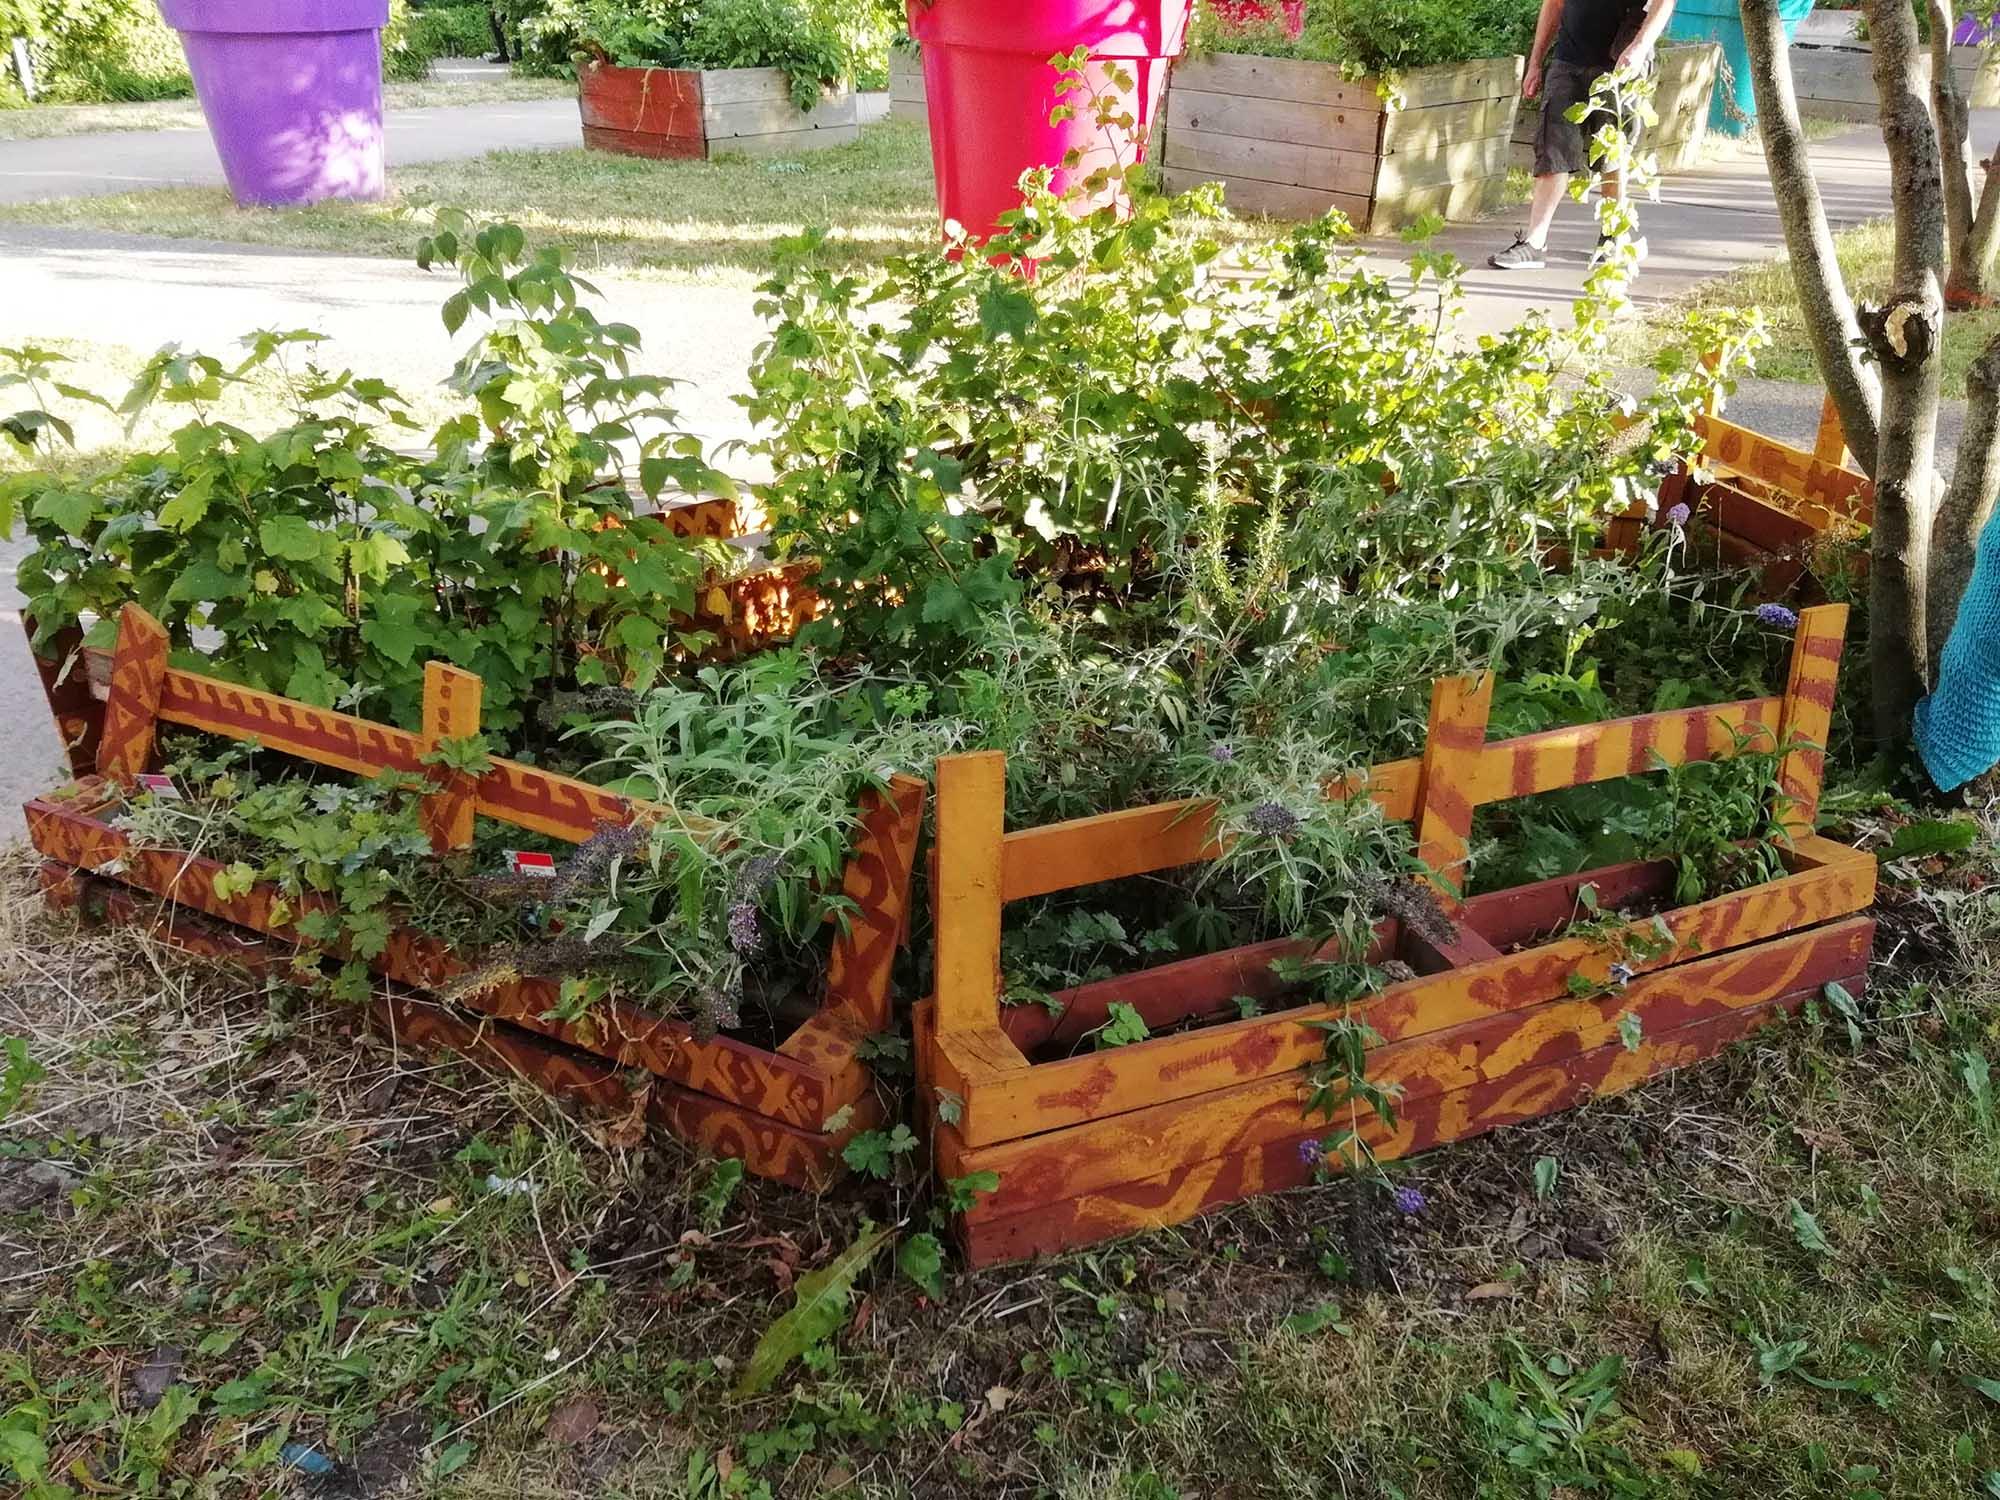 https://www.champigny94.fr/sites/default/files/mediatheque/urbanisme_habitat_cadre_de_vie/environnement/2018-07-plantes-mptba-02-cs-2k.jpg